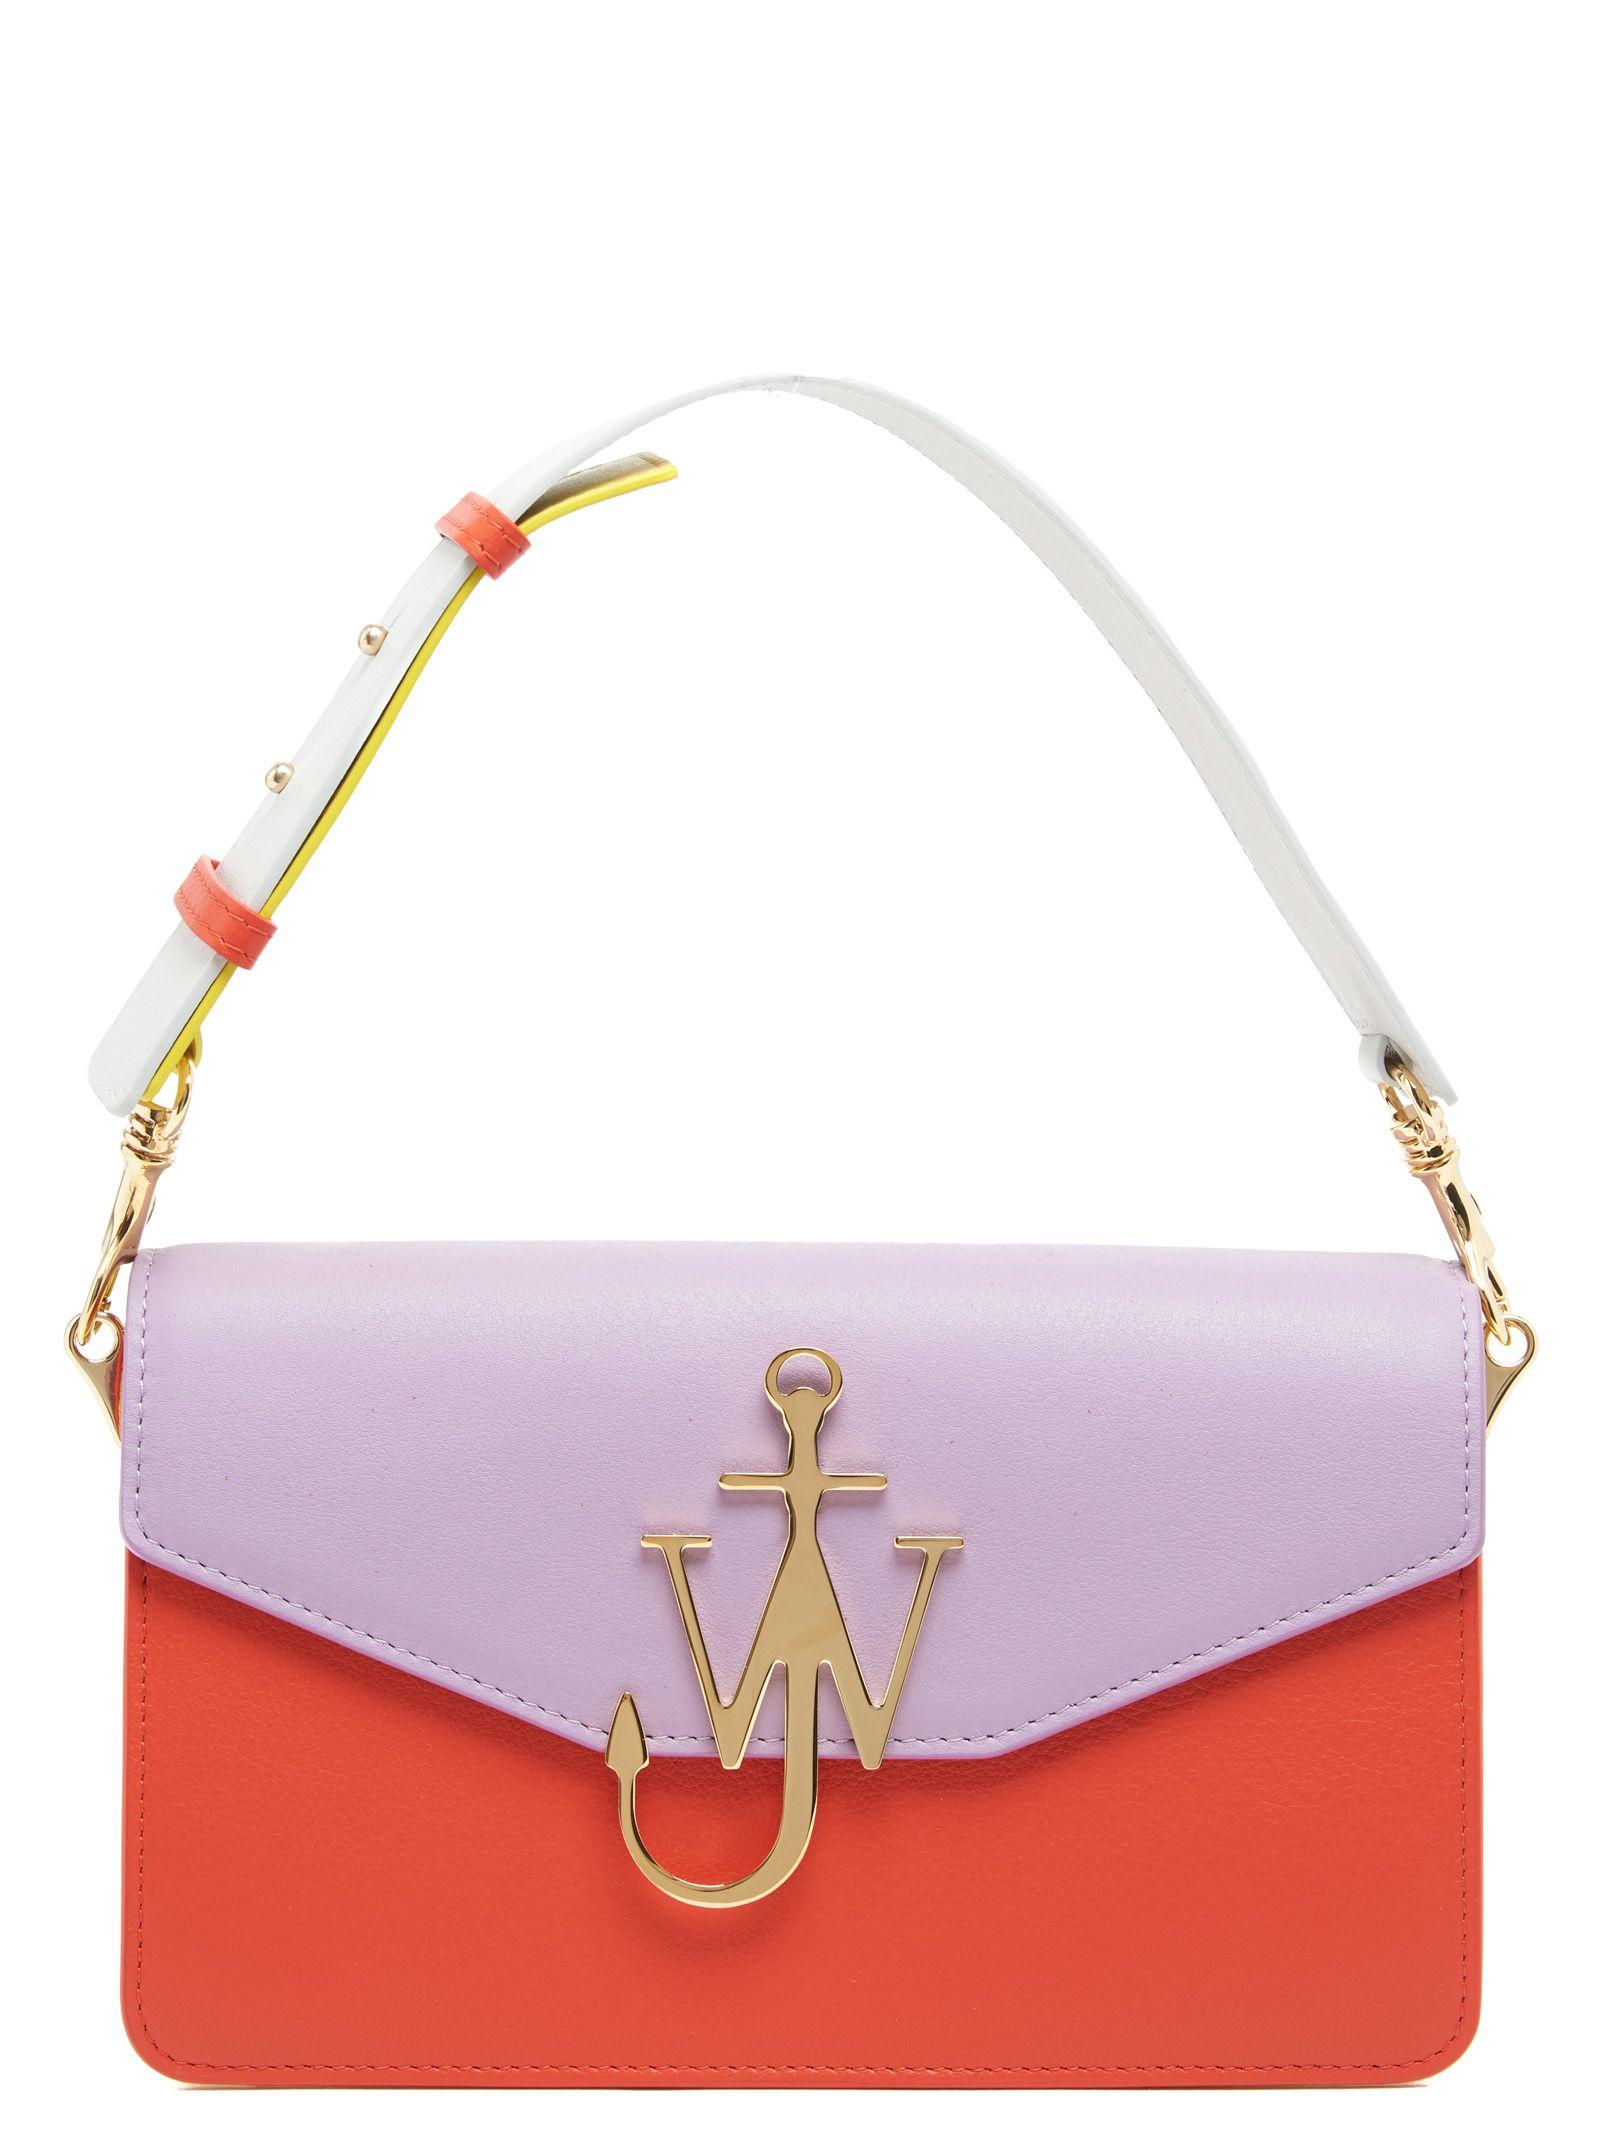 J.w. Anderson Handbag